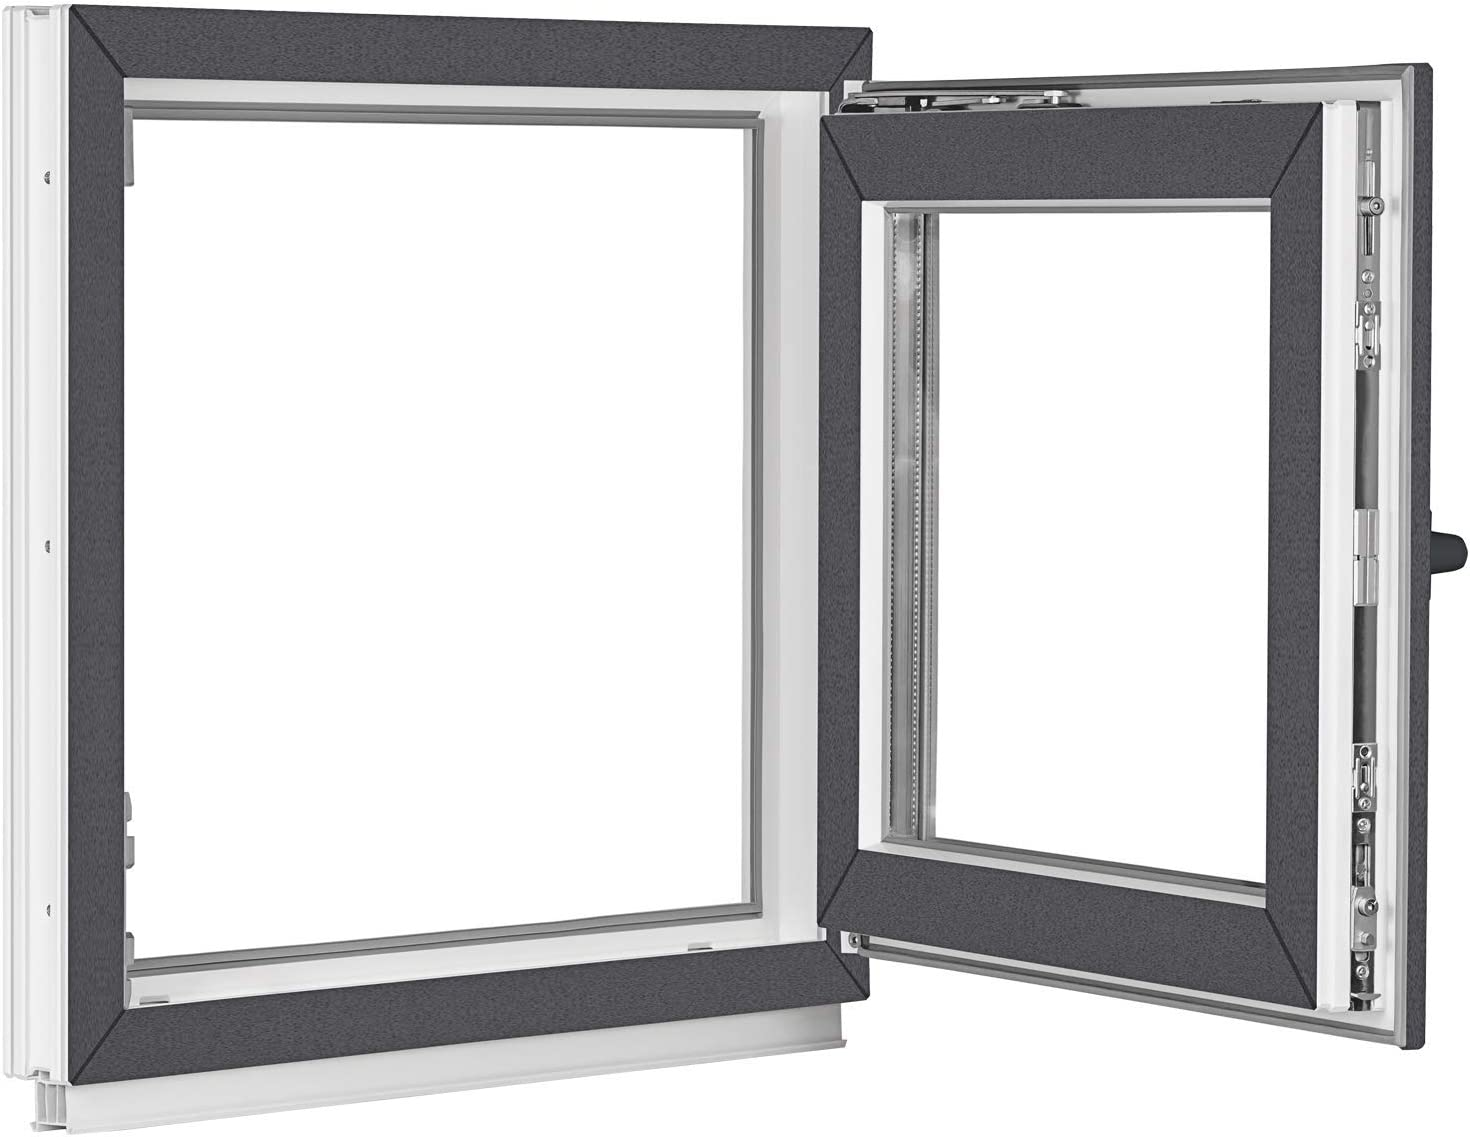 ALLE GR/Ö/ßEN Dreh-Kipp Fenster Kellerfenster Kunststofffenster wei/ß 3 fach Verglasung Premium BxH:75x50 cm DIN Rechts